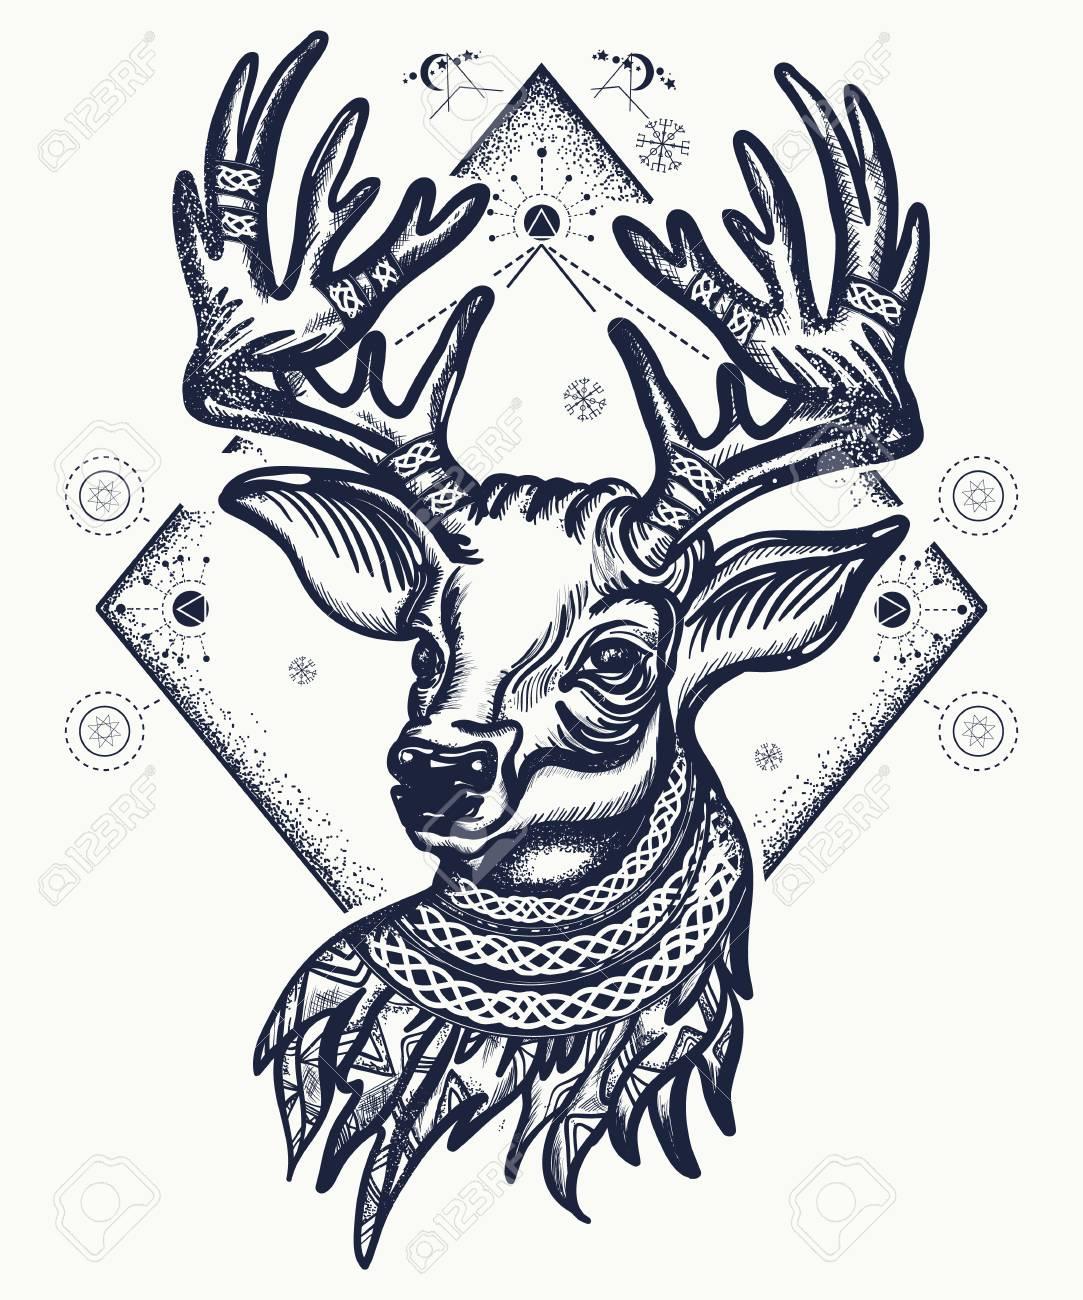 Deer Tattoo And T Shirt Design Christmas Reindeer Symbol Of